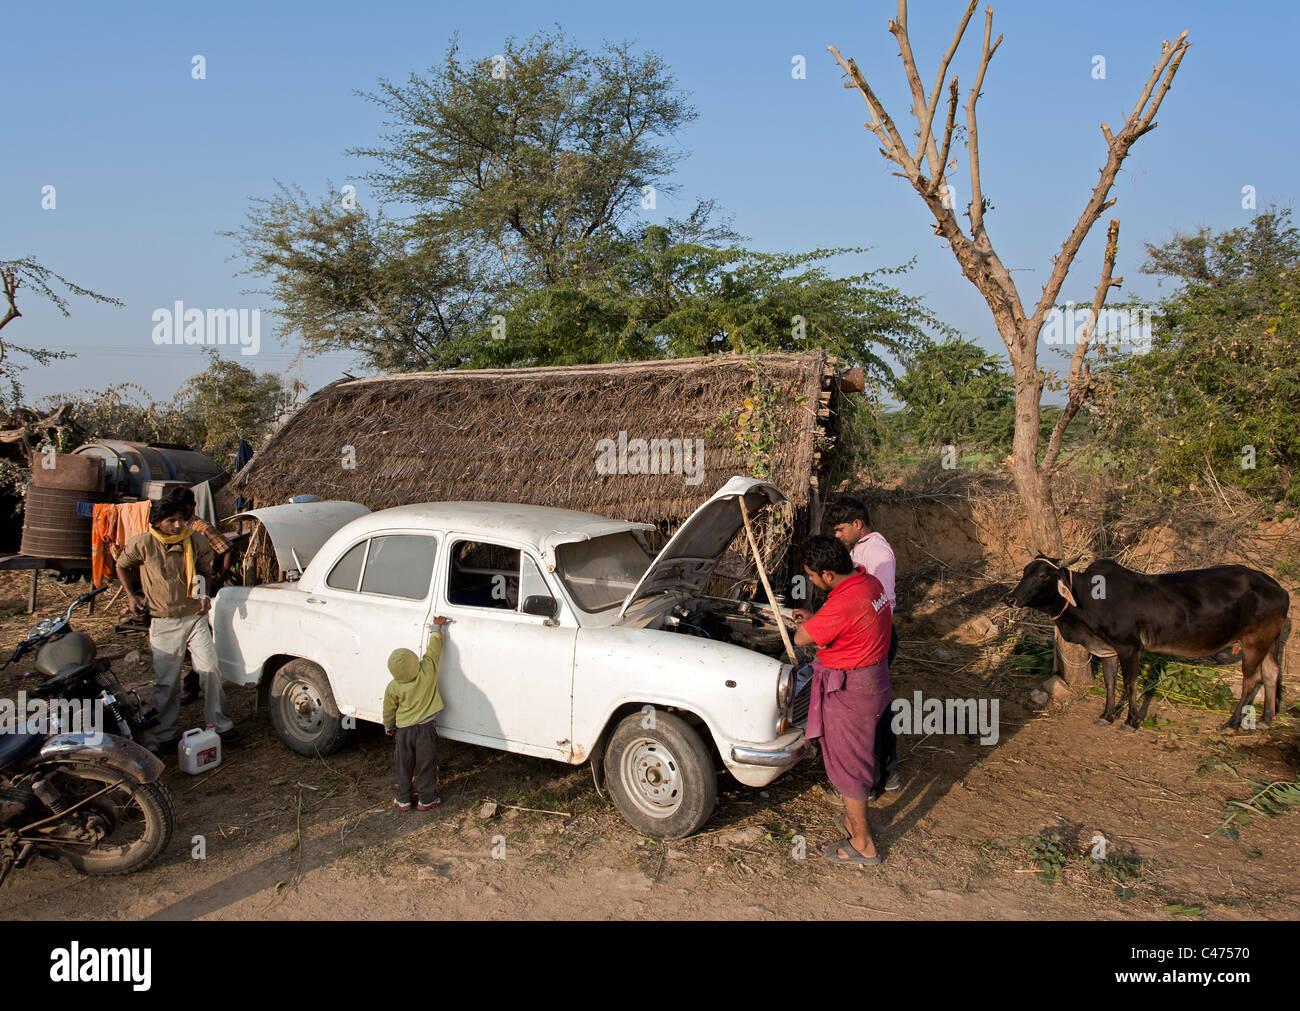 Indian men repairing an old hindustan ambassador car. Pushkar. Rajasthan. India - Stock Image